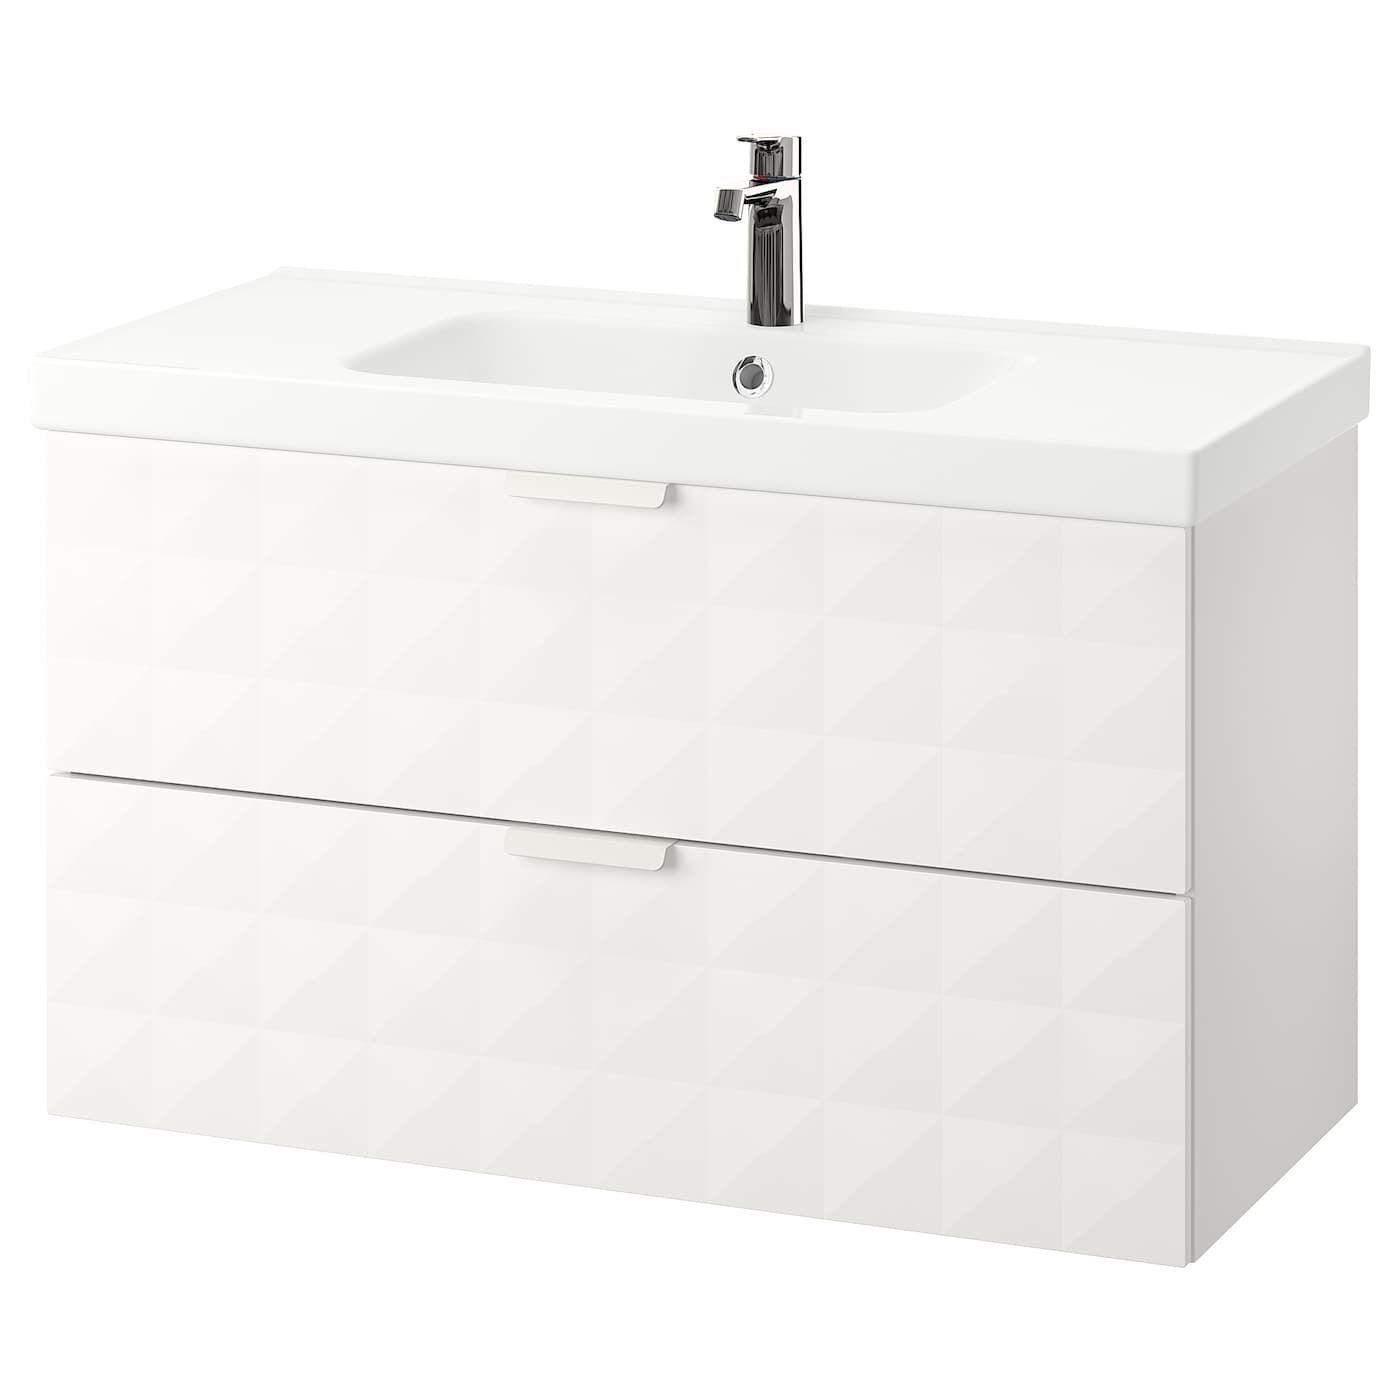 Godmorgon Odensvik Meuble Pour Lavabo 2 Tiroirs Resjon Blanc Ikea Meuble Lavabo Lavabo Tiroir